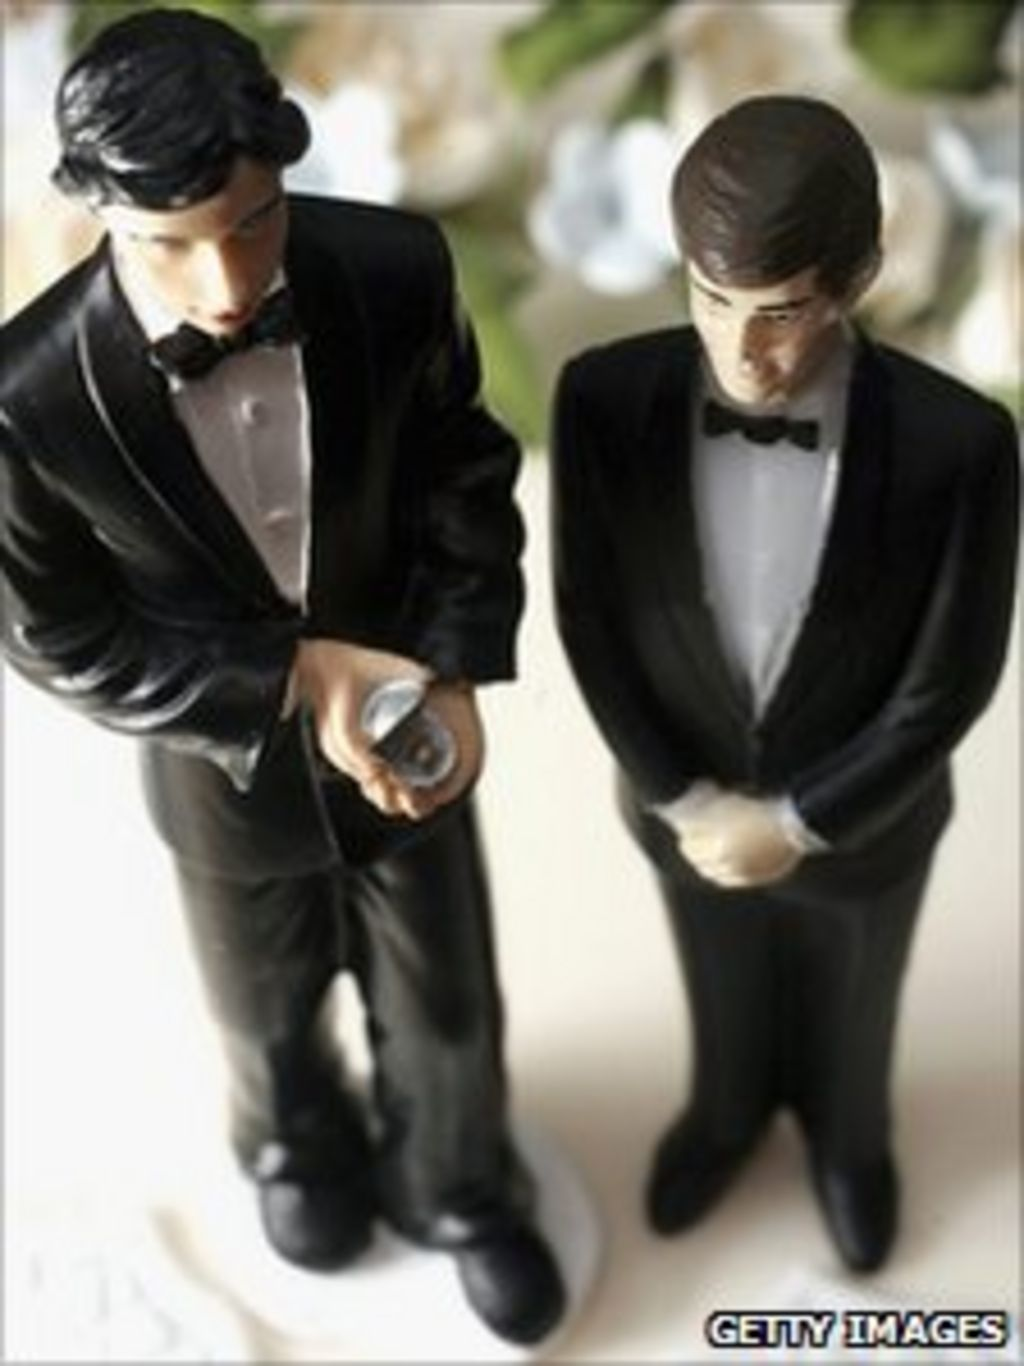 Island civil partnerships legal